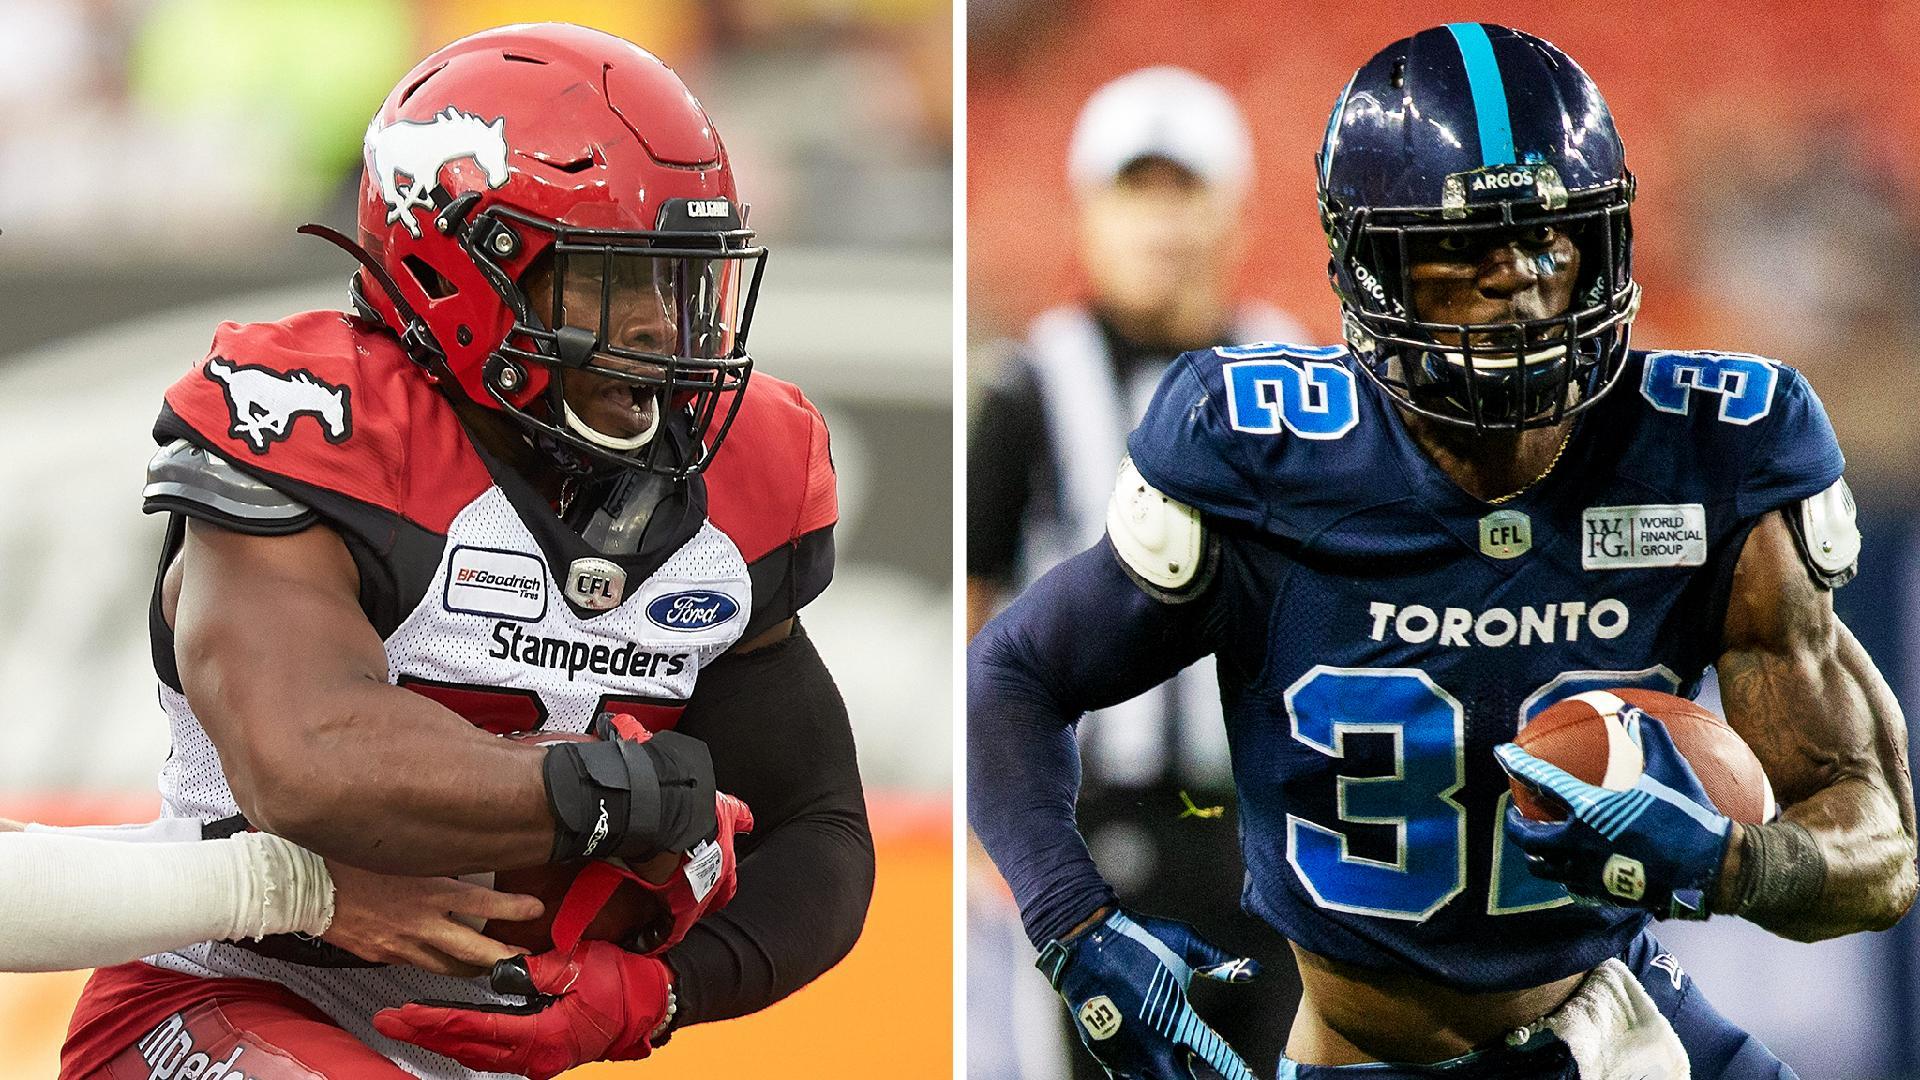 Preview: Calgary at Toronto, wk.15 - CFL.ca